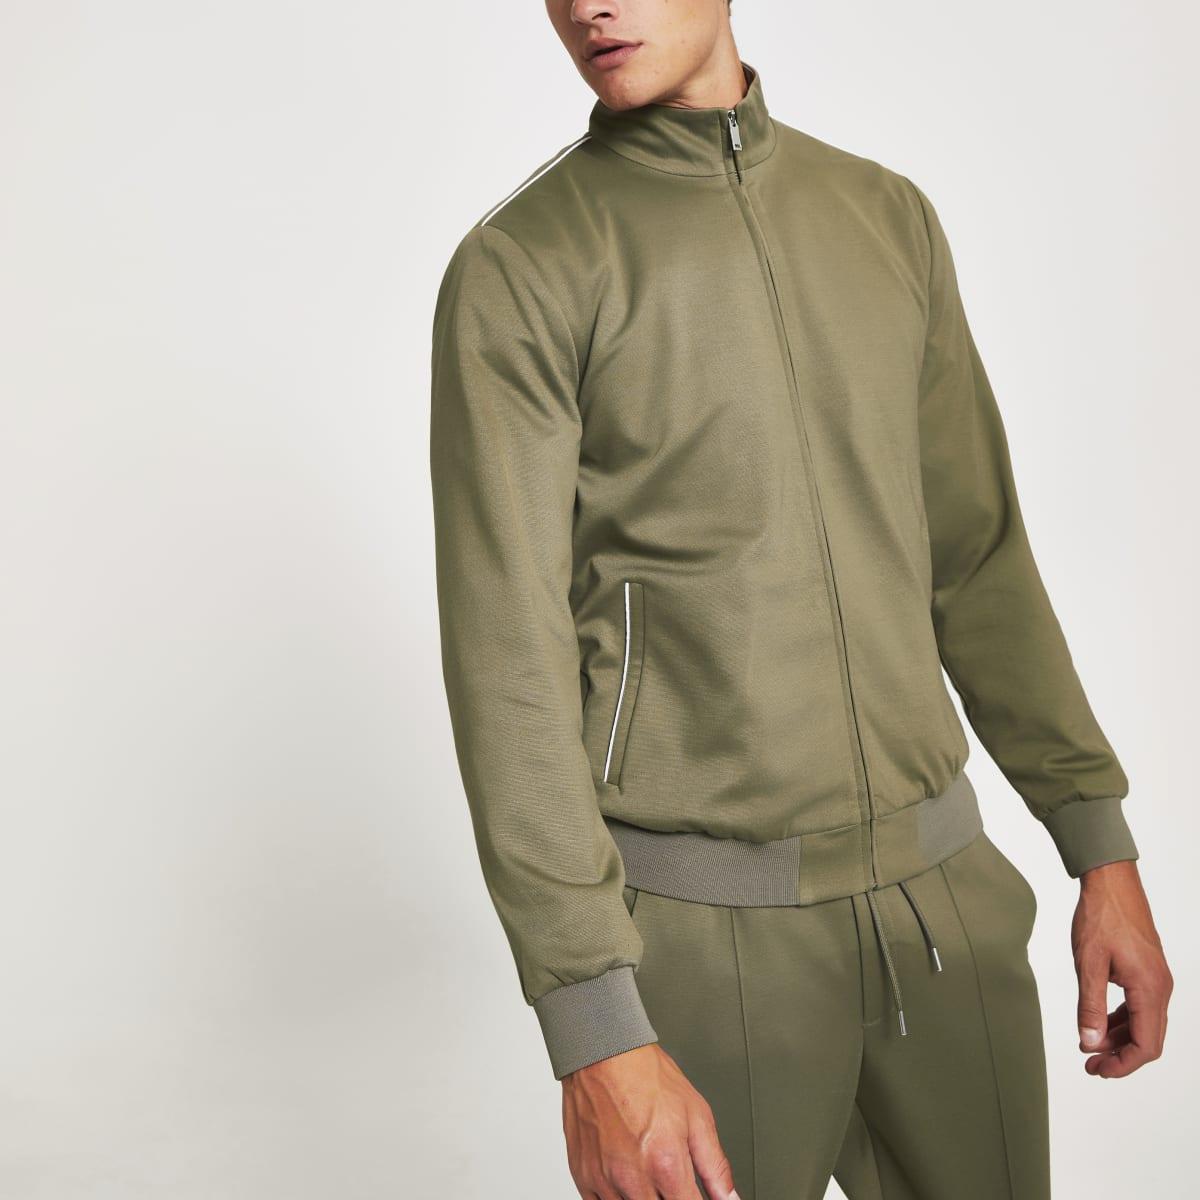 Khaki Maison Riviera skinny bomber jacket